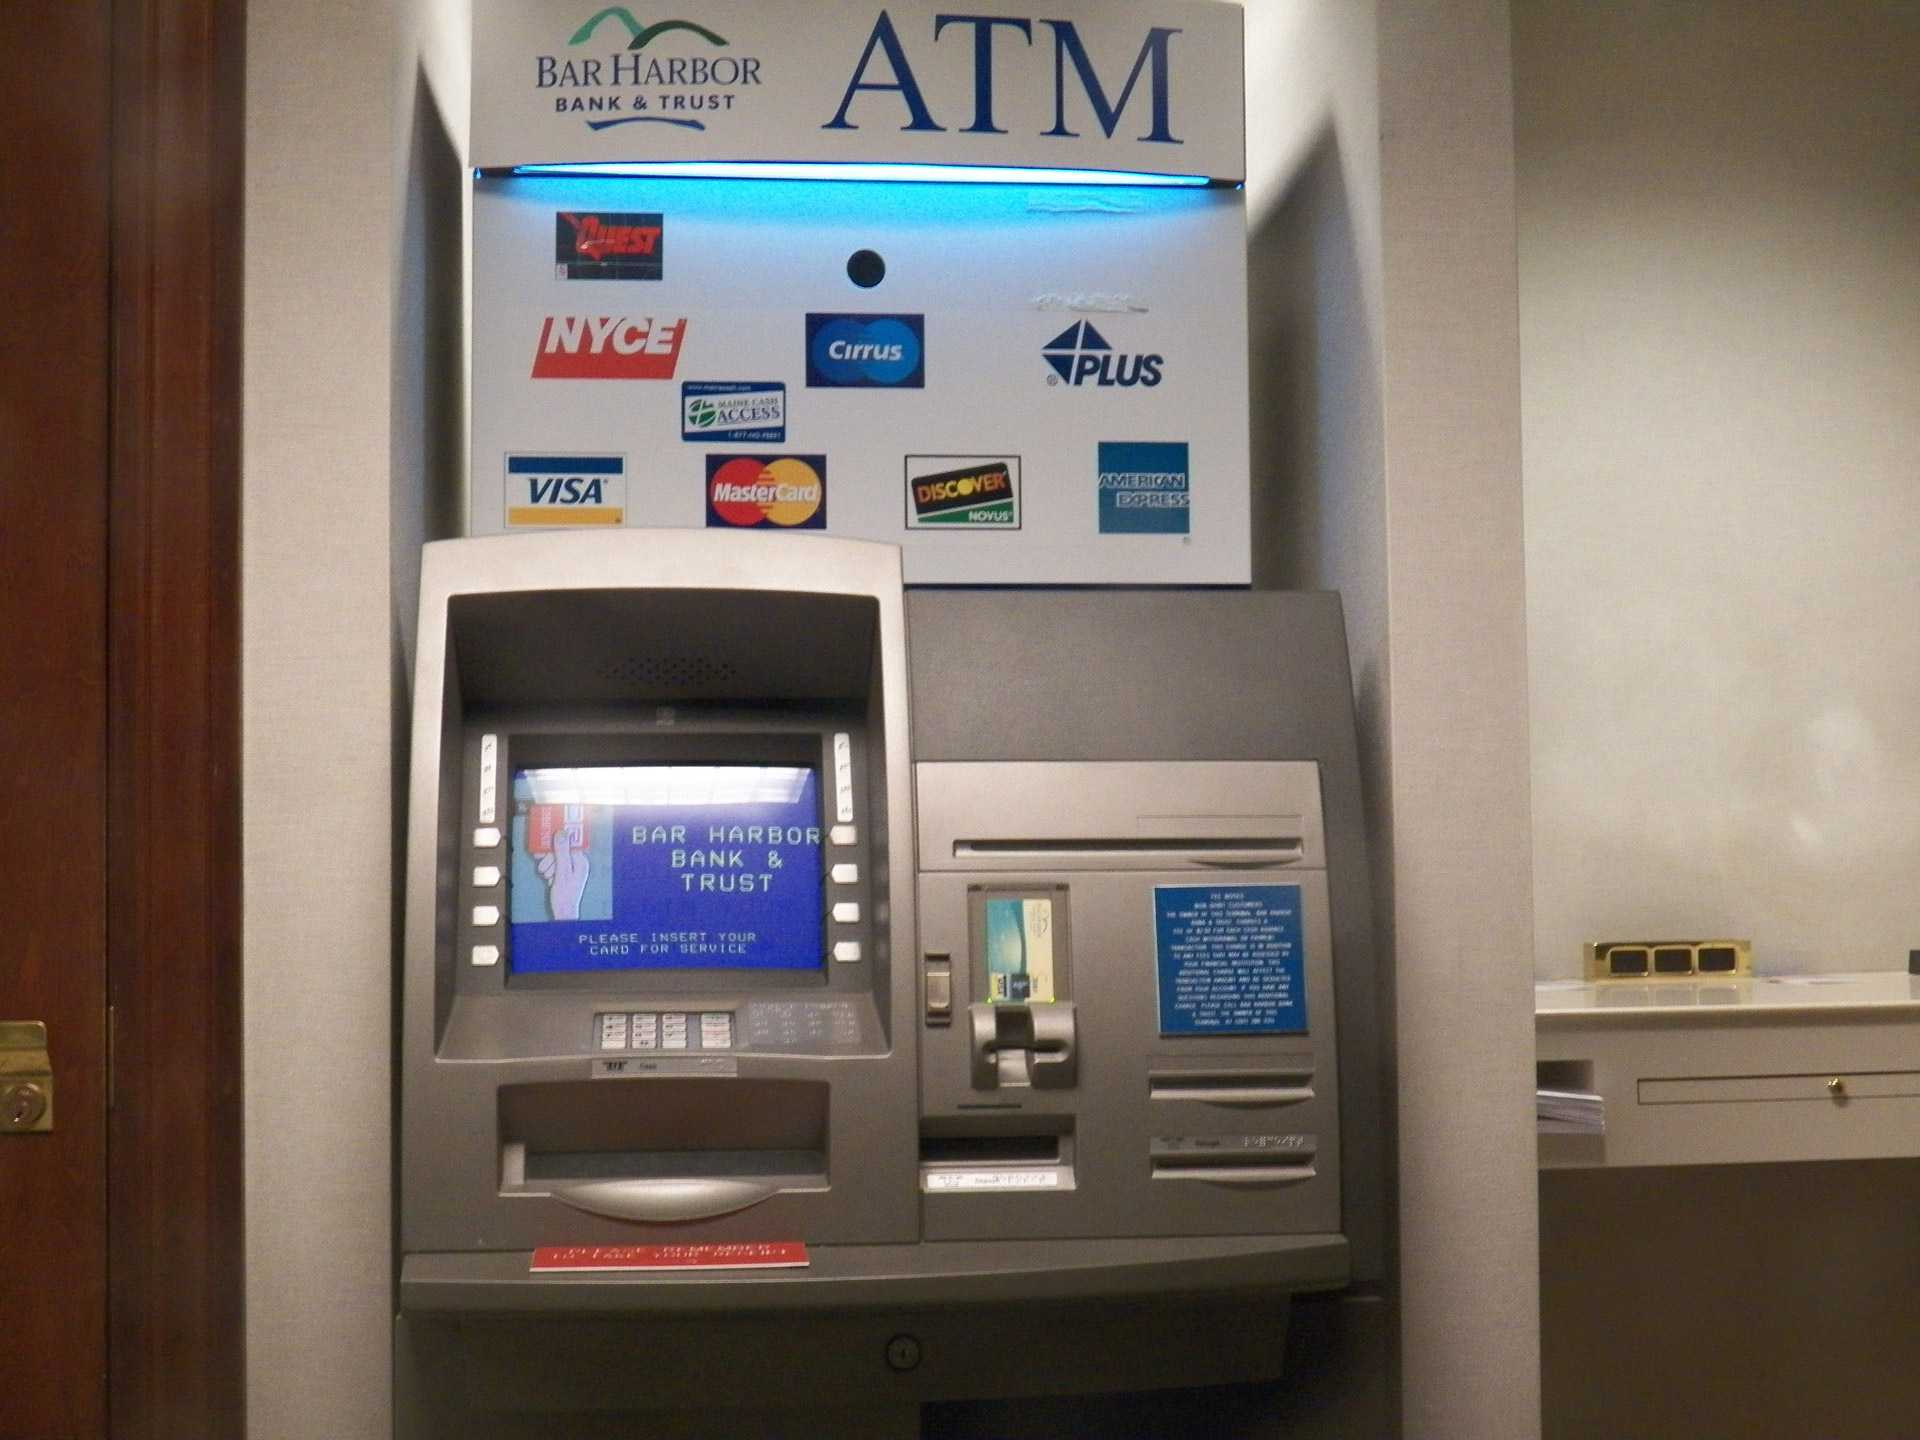 Atm machine,atm,money,change,bills - free image from needpix.com